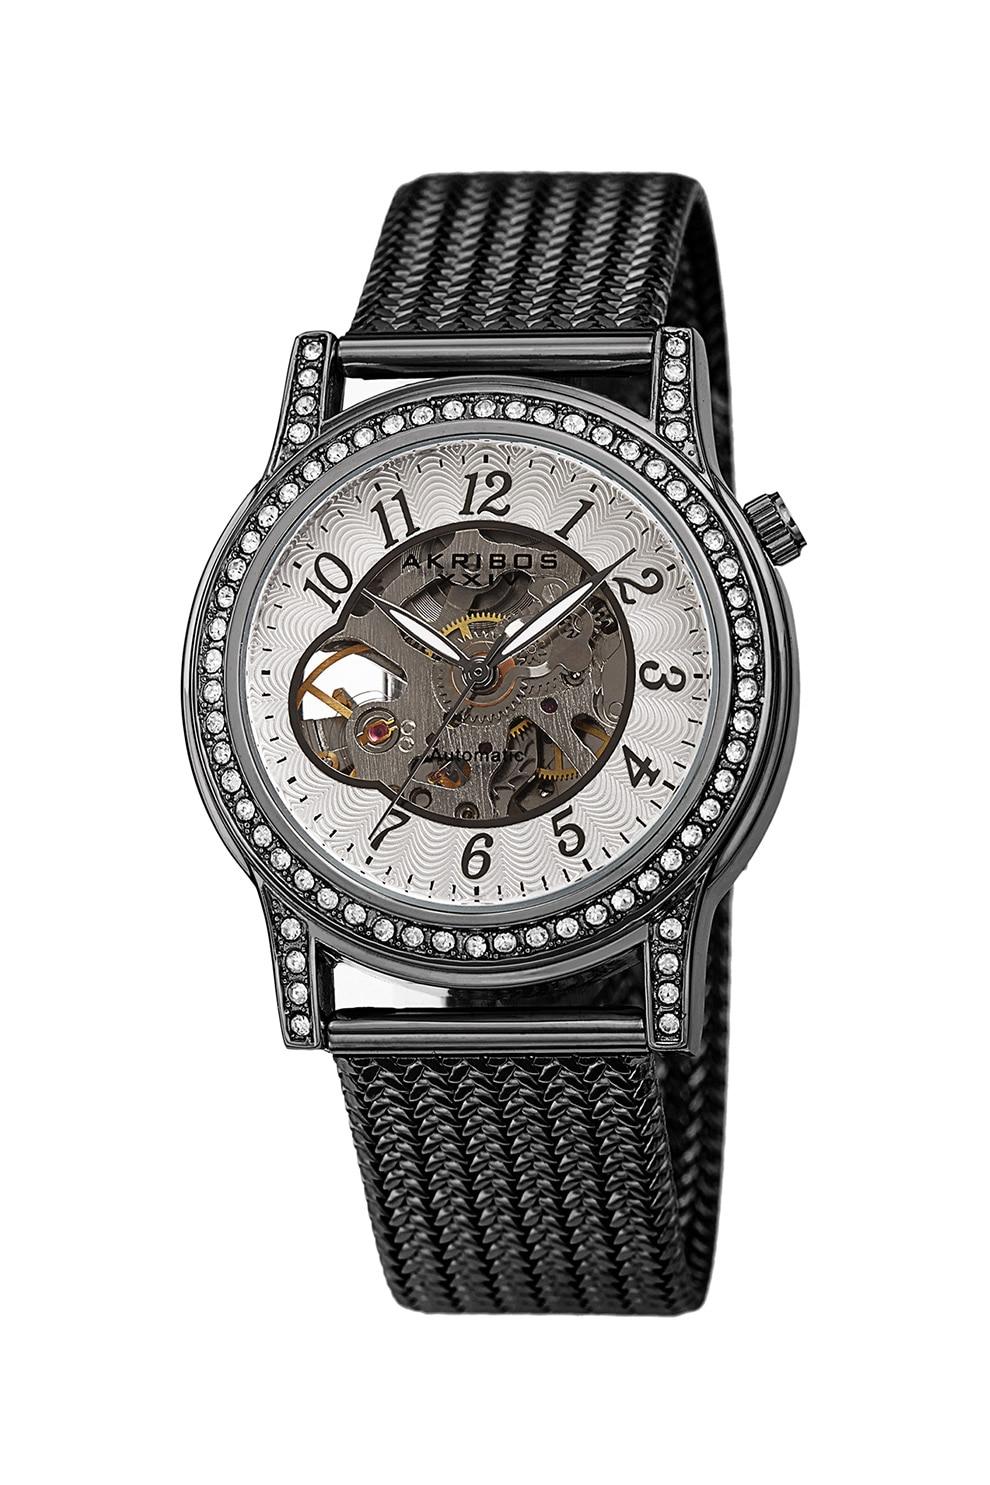 Fotografie AKRIBOS XXIV, Ceas automatic cu cristale si cadran cu mecanism partial vizibil, Argintiu inchis